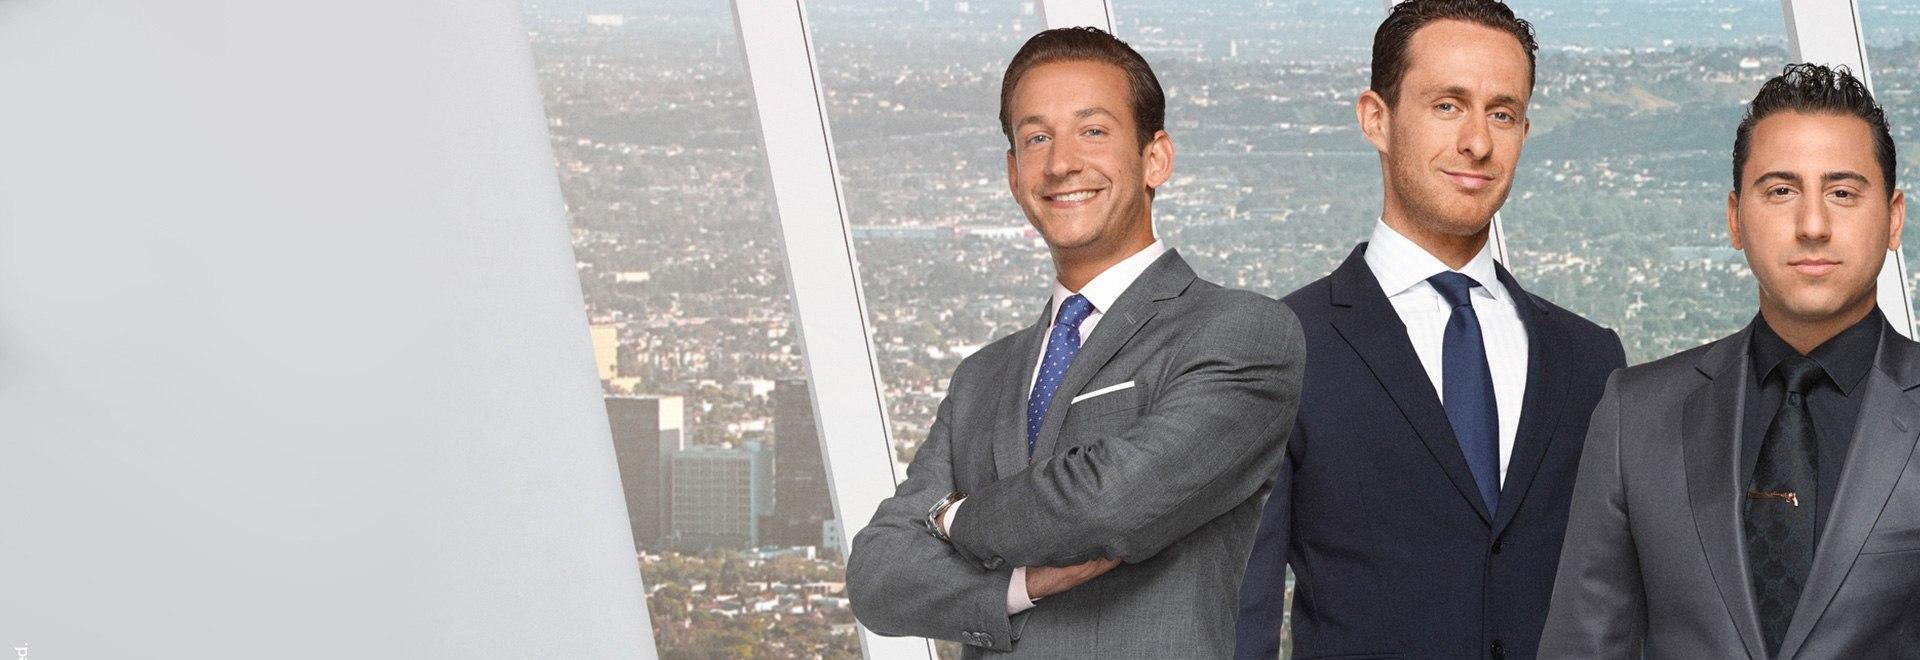 Case da milionari LA